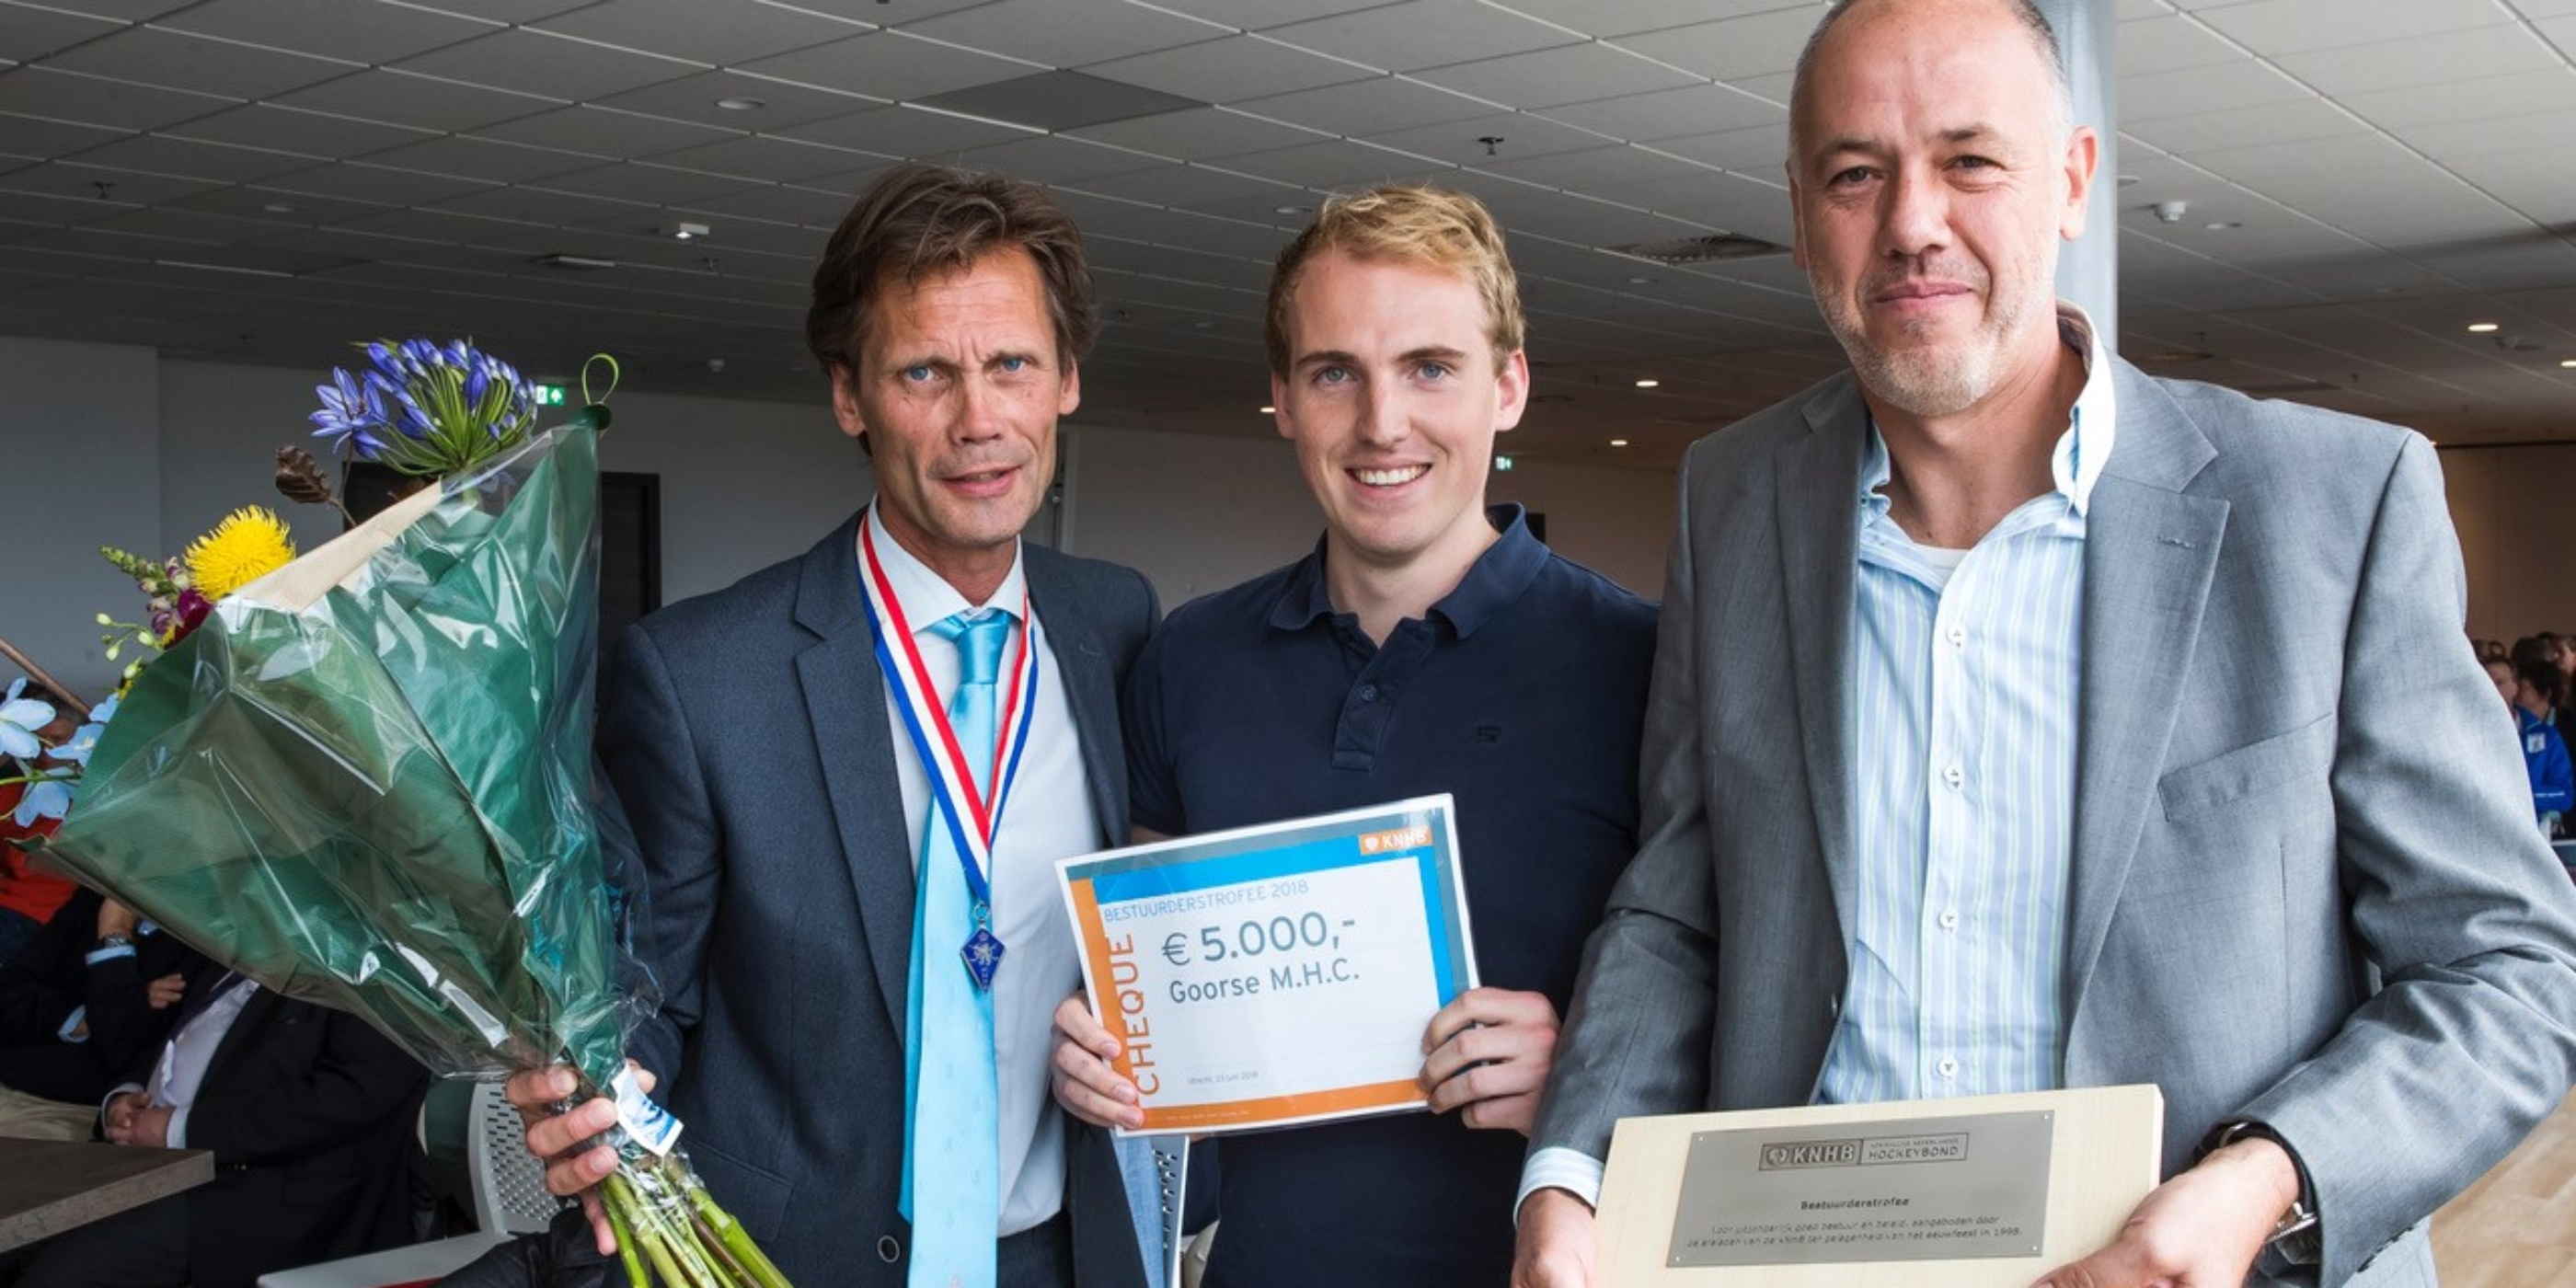 Goorse Mixed Hockey Club wint Bestuurderstrofee 2018